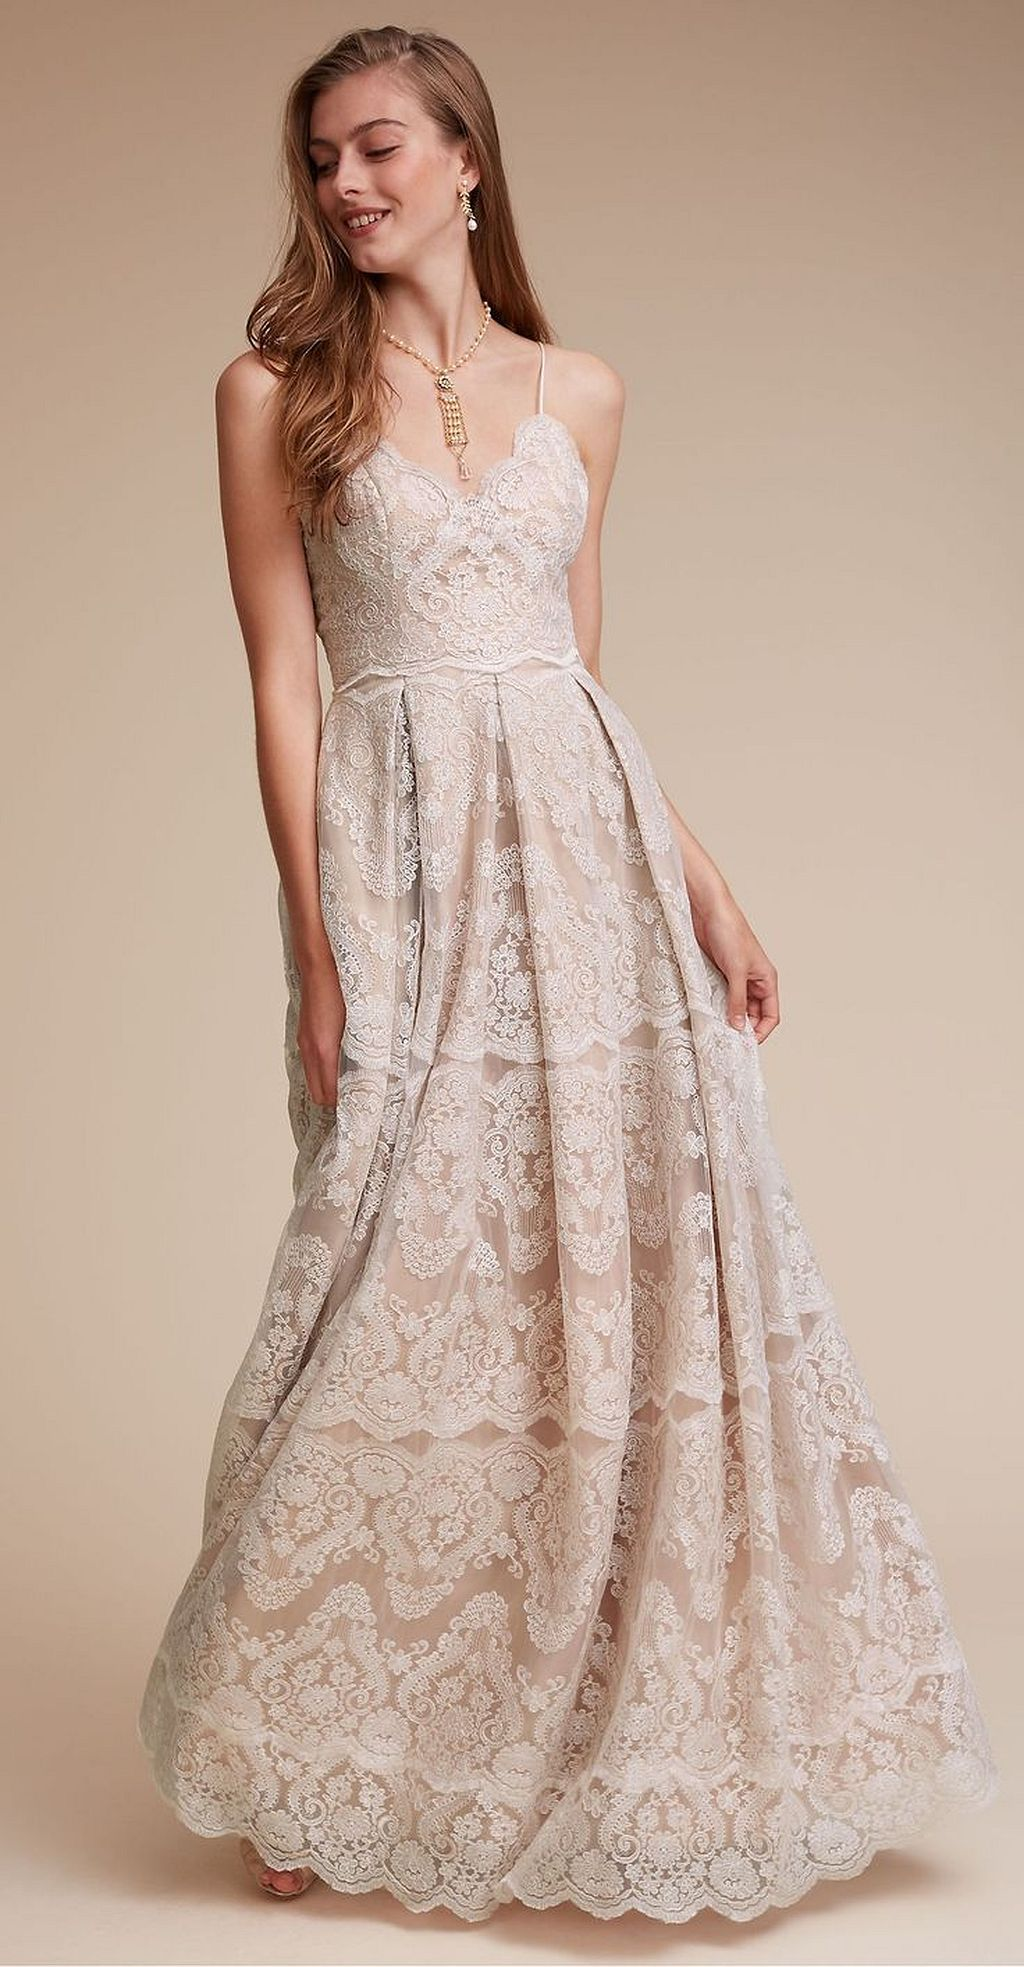 Gorgeous gorgeous vintage wedding dresses ideas weddmagz